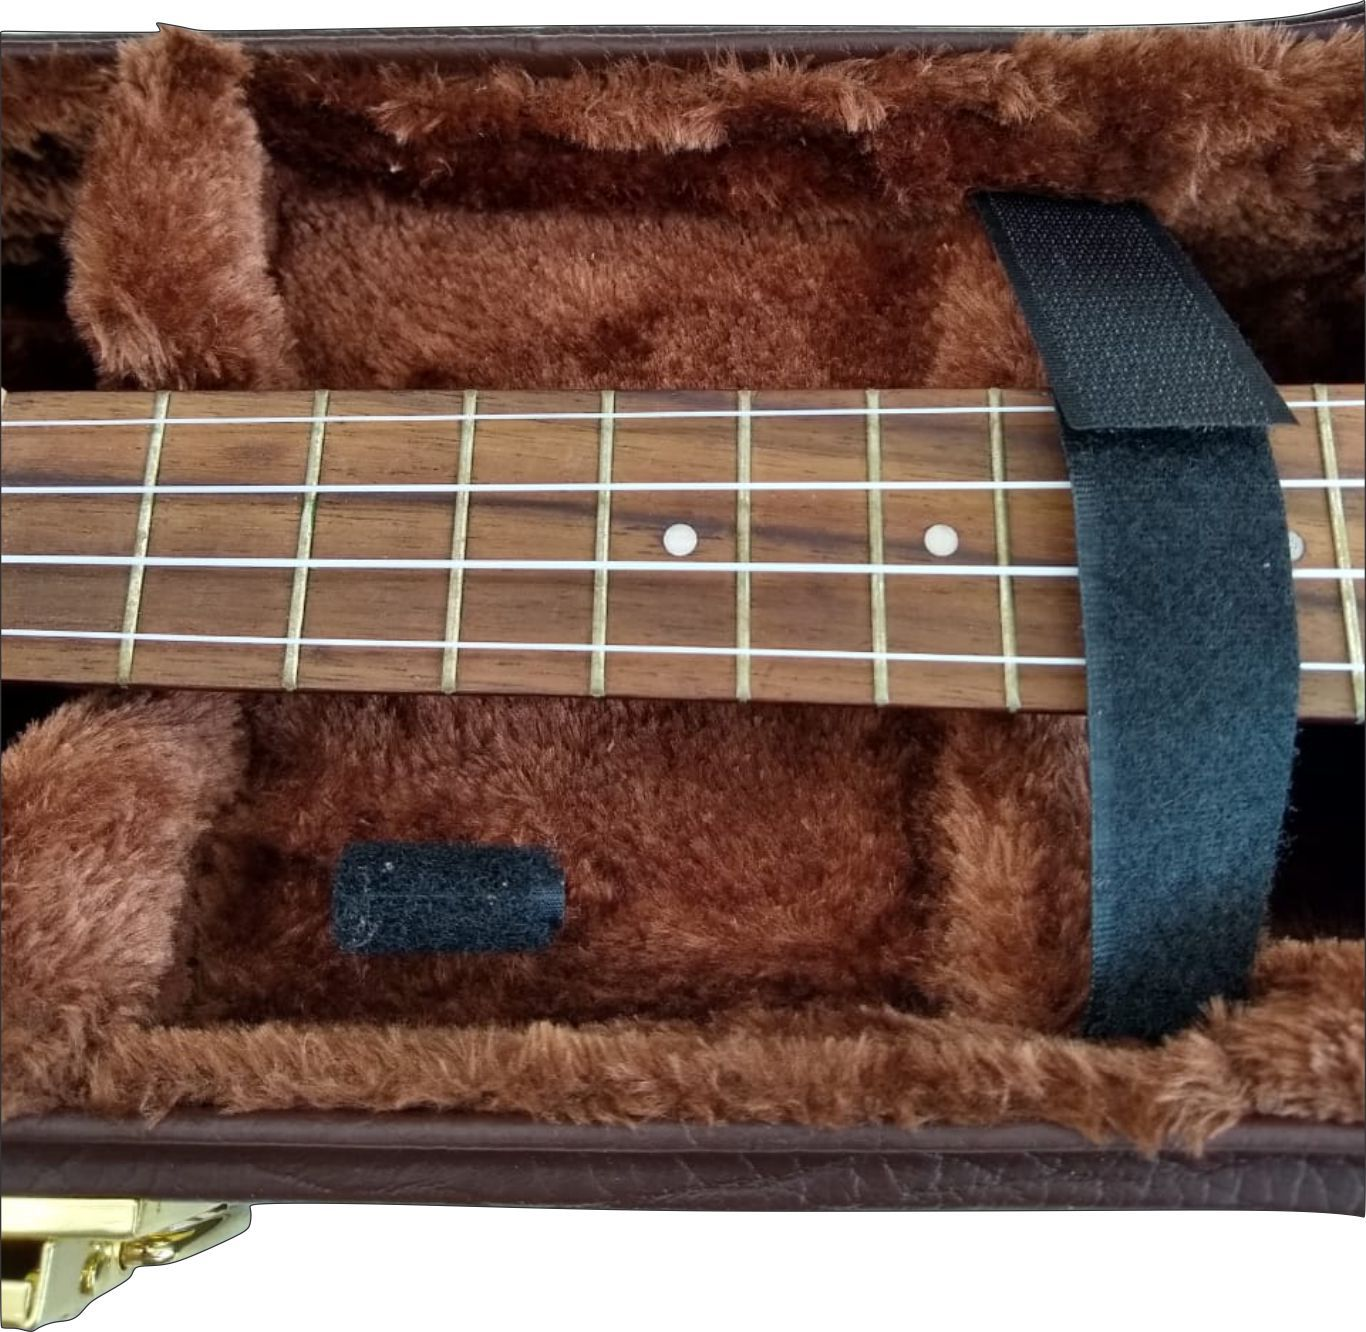 Case Térmico Para Banjo Extra Luxo Fama